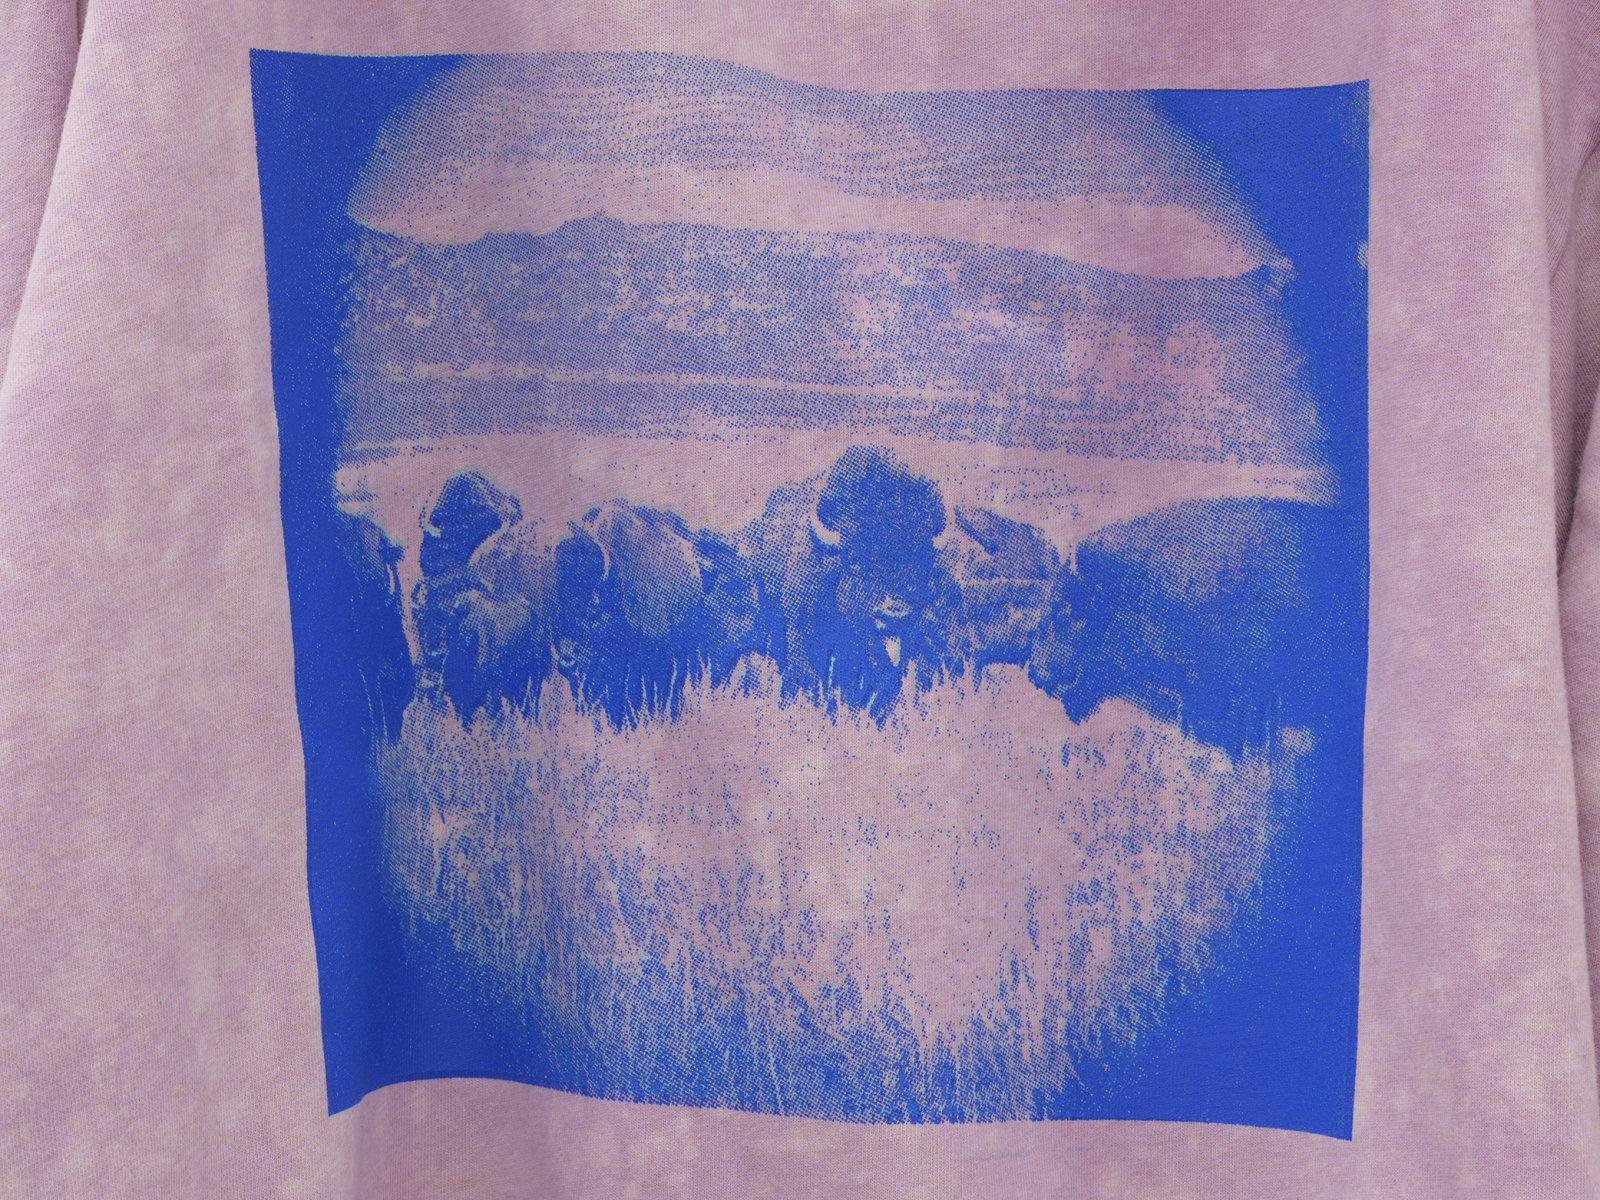 Duane Linklater, silentstar, delicacy (detail), 2020, handmade hoodie, cochineal dye, silkscreen, nails, 56 x 20 x 5 in. (142 x 51 x 13 cm)